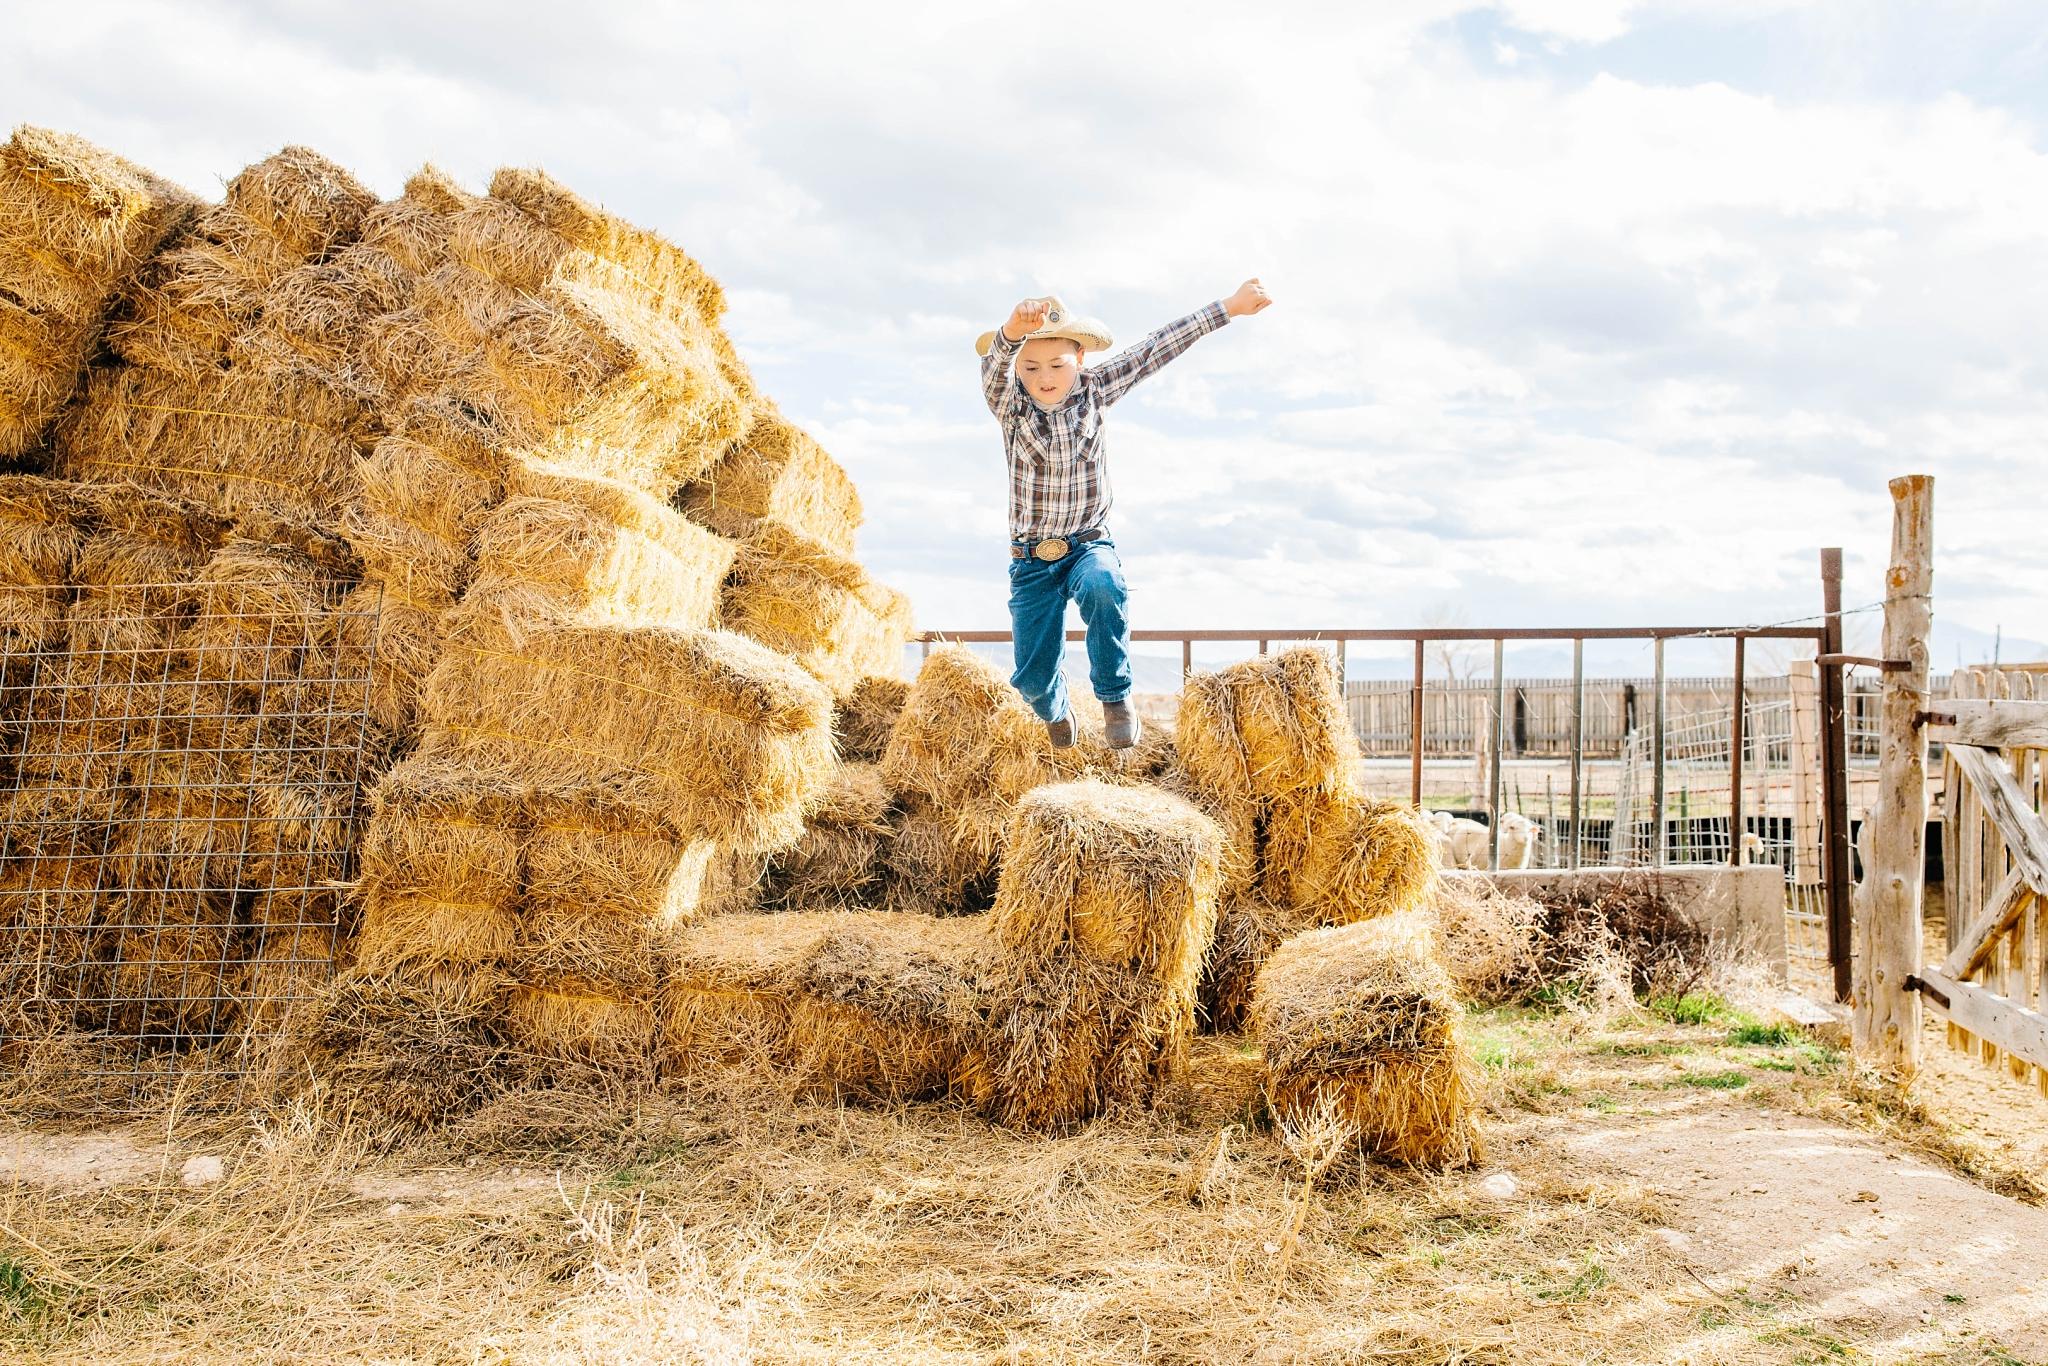 Lister-28_Lizzie-B-Imagery-Utah-Family-Photographer-Lifestyle-Photography-Salt-Lake-City-Park-City-Utah-County-Farm-Family-Session.jpg